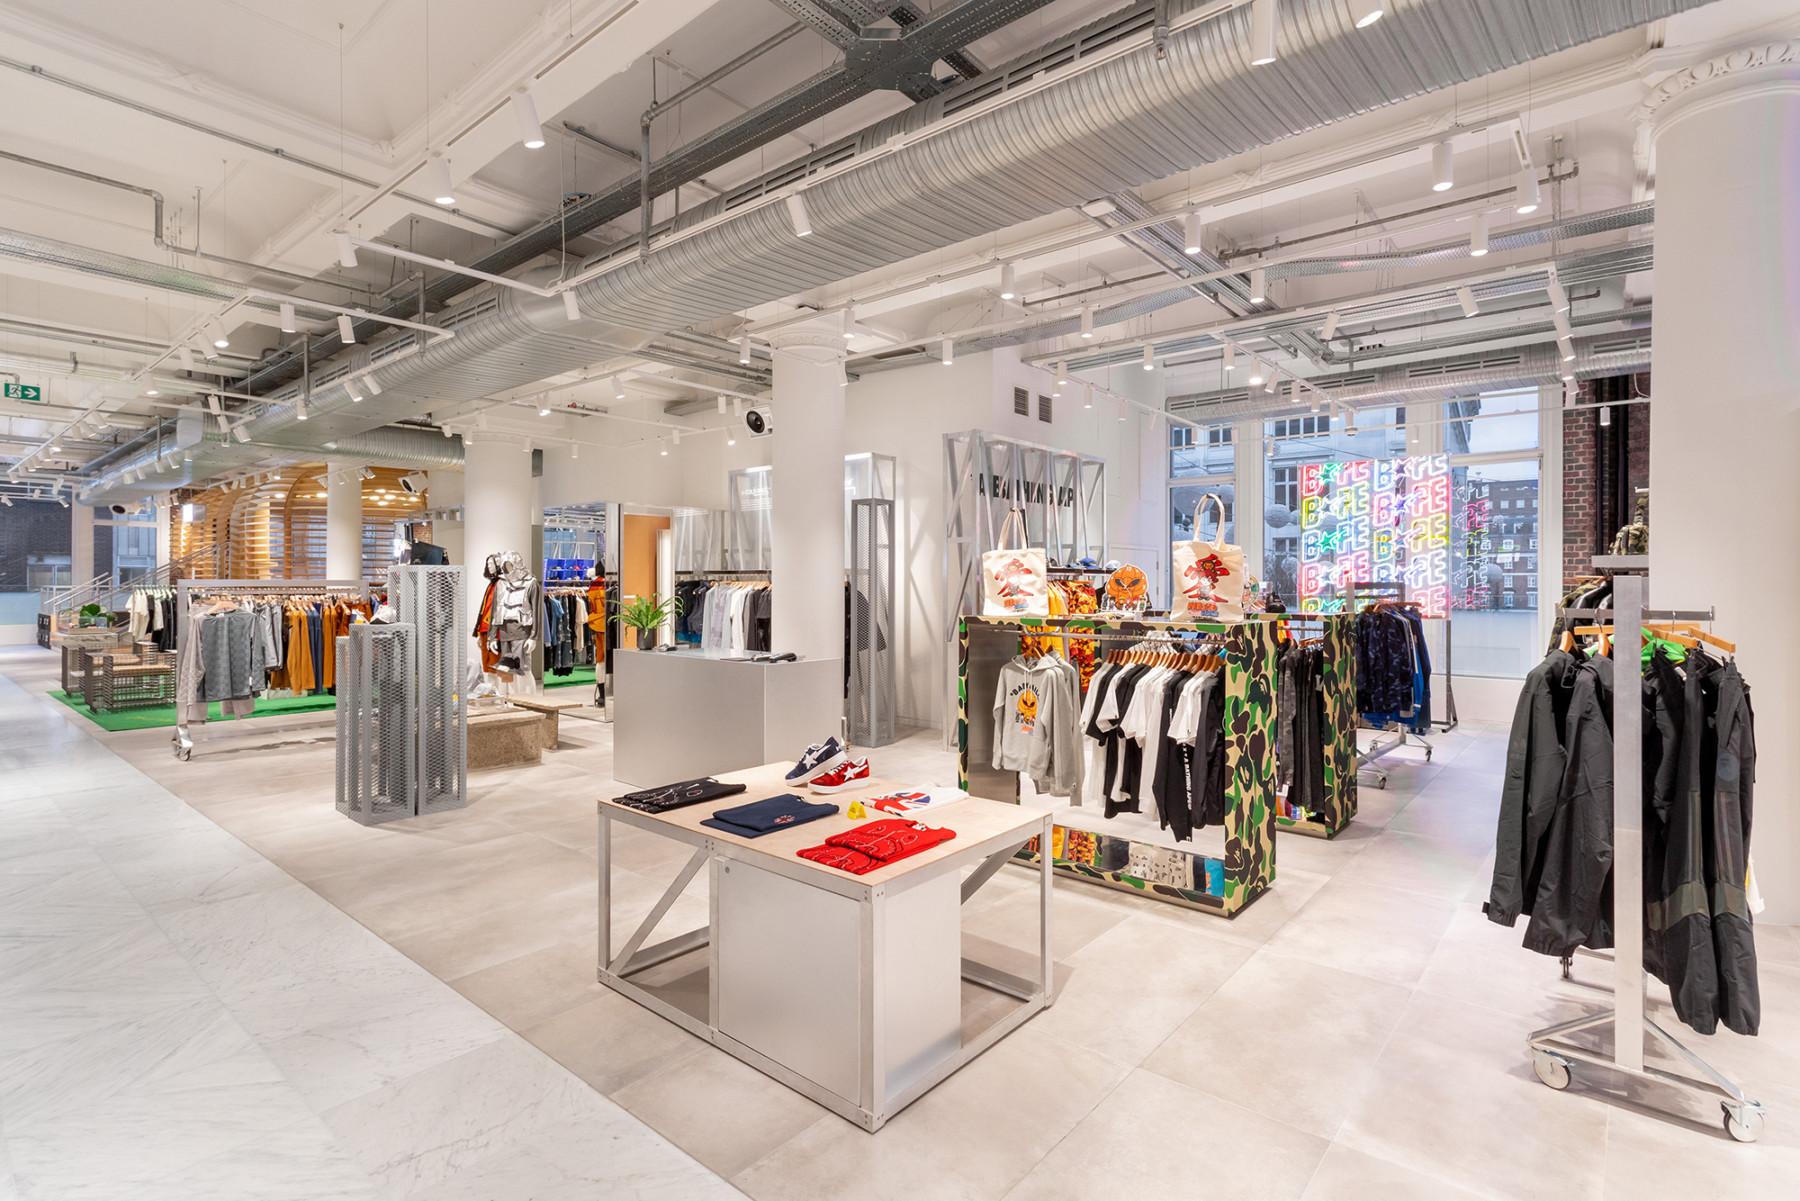 Jamie-fobert-architects-selfridges-shop-retail-interior-design-menswear-fashion-designer-street-rooms (13)